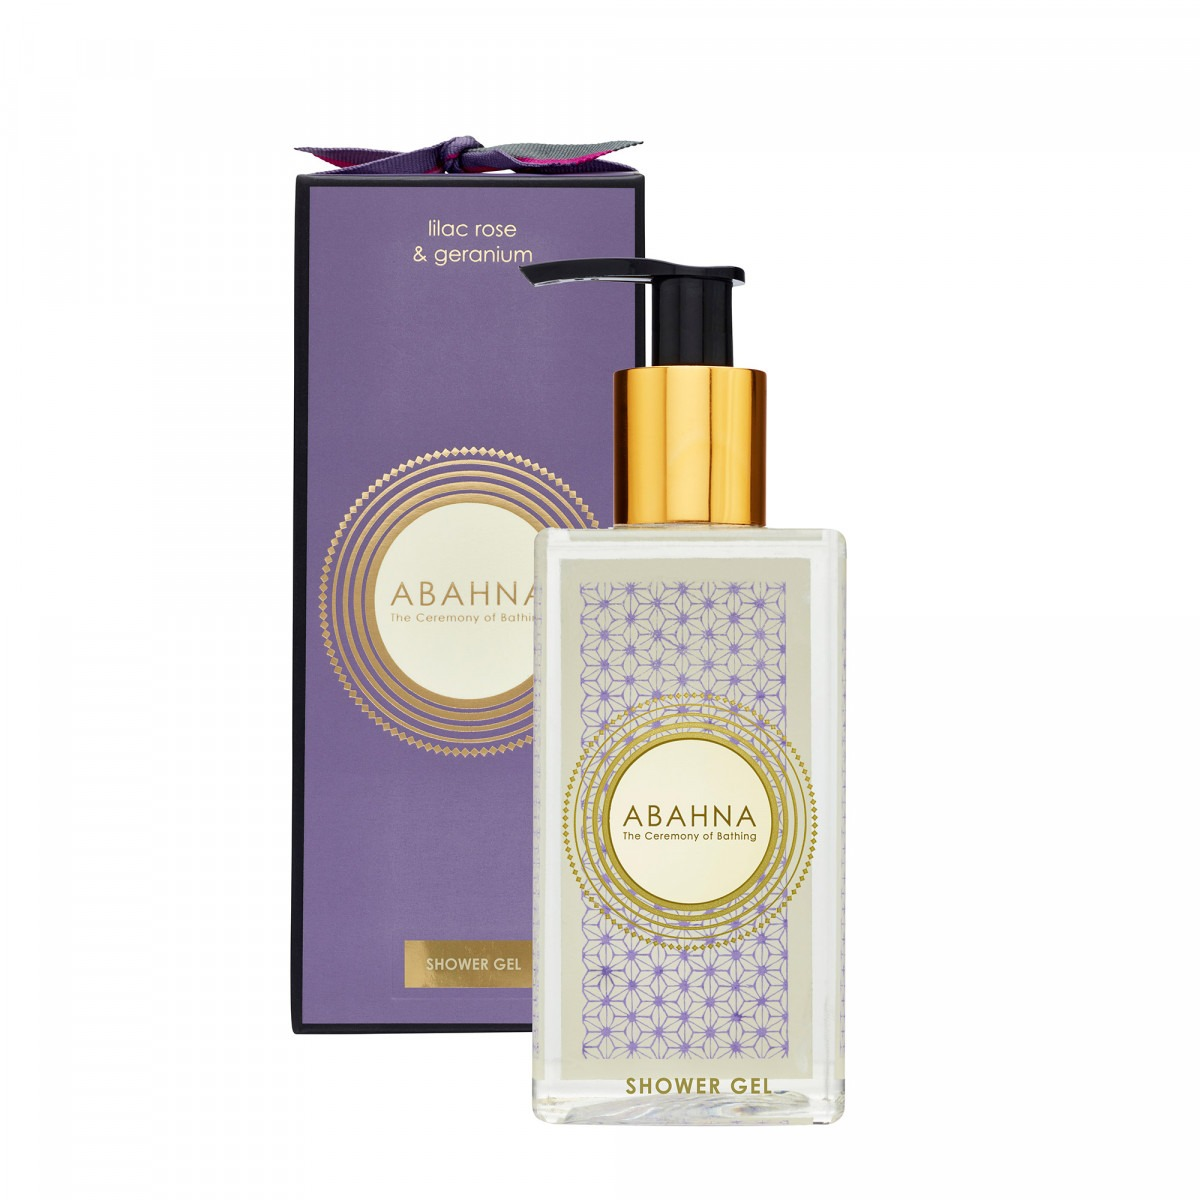 Abahna lilac rose & geranium shower gel 250ml